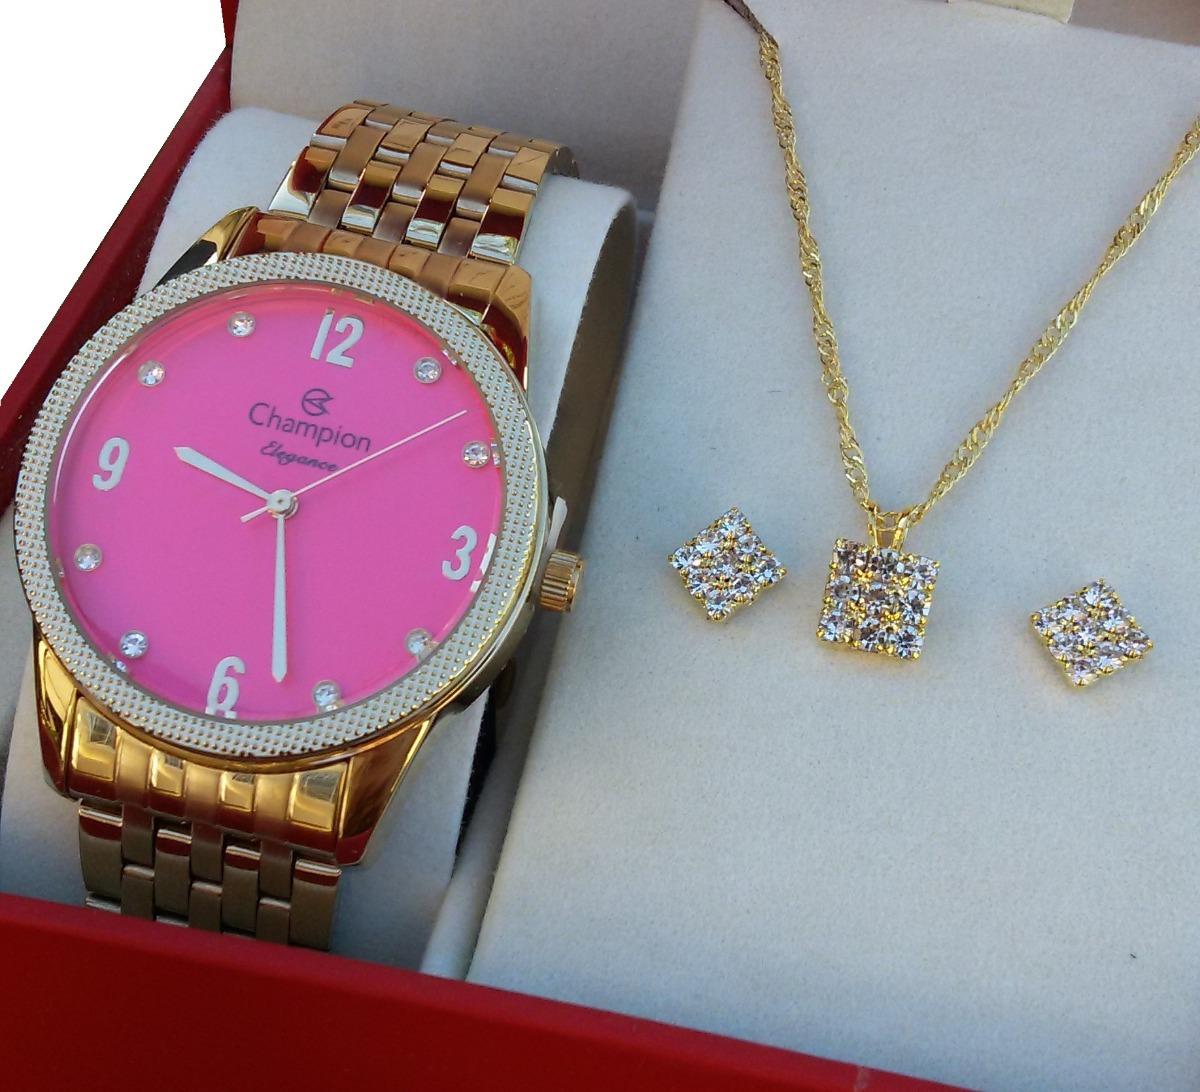 b8571a952eb kit relógio cn26082j champion dourado feminino frete gratis. Carregando zoom .